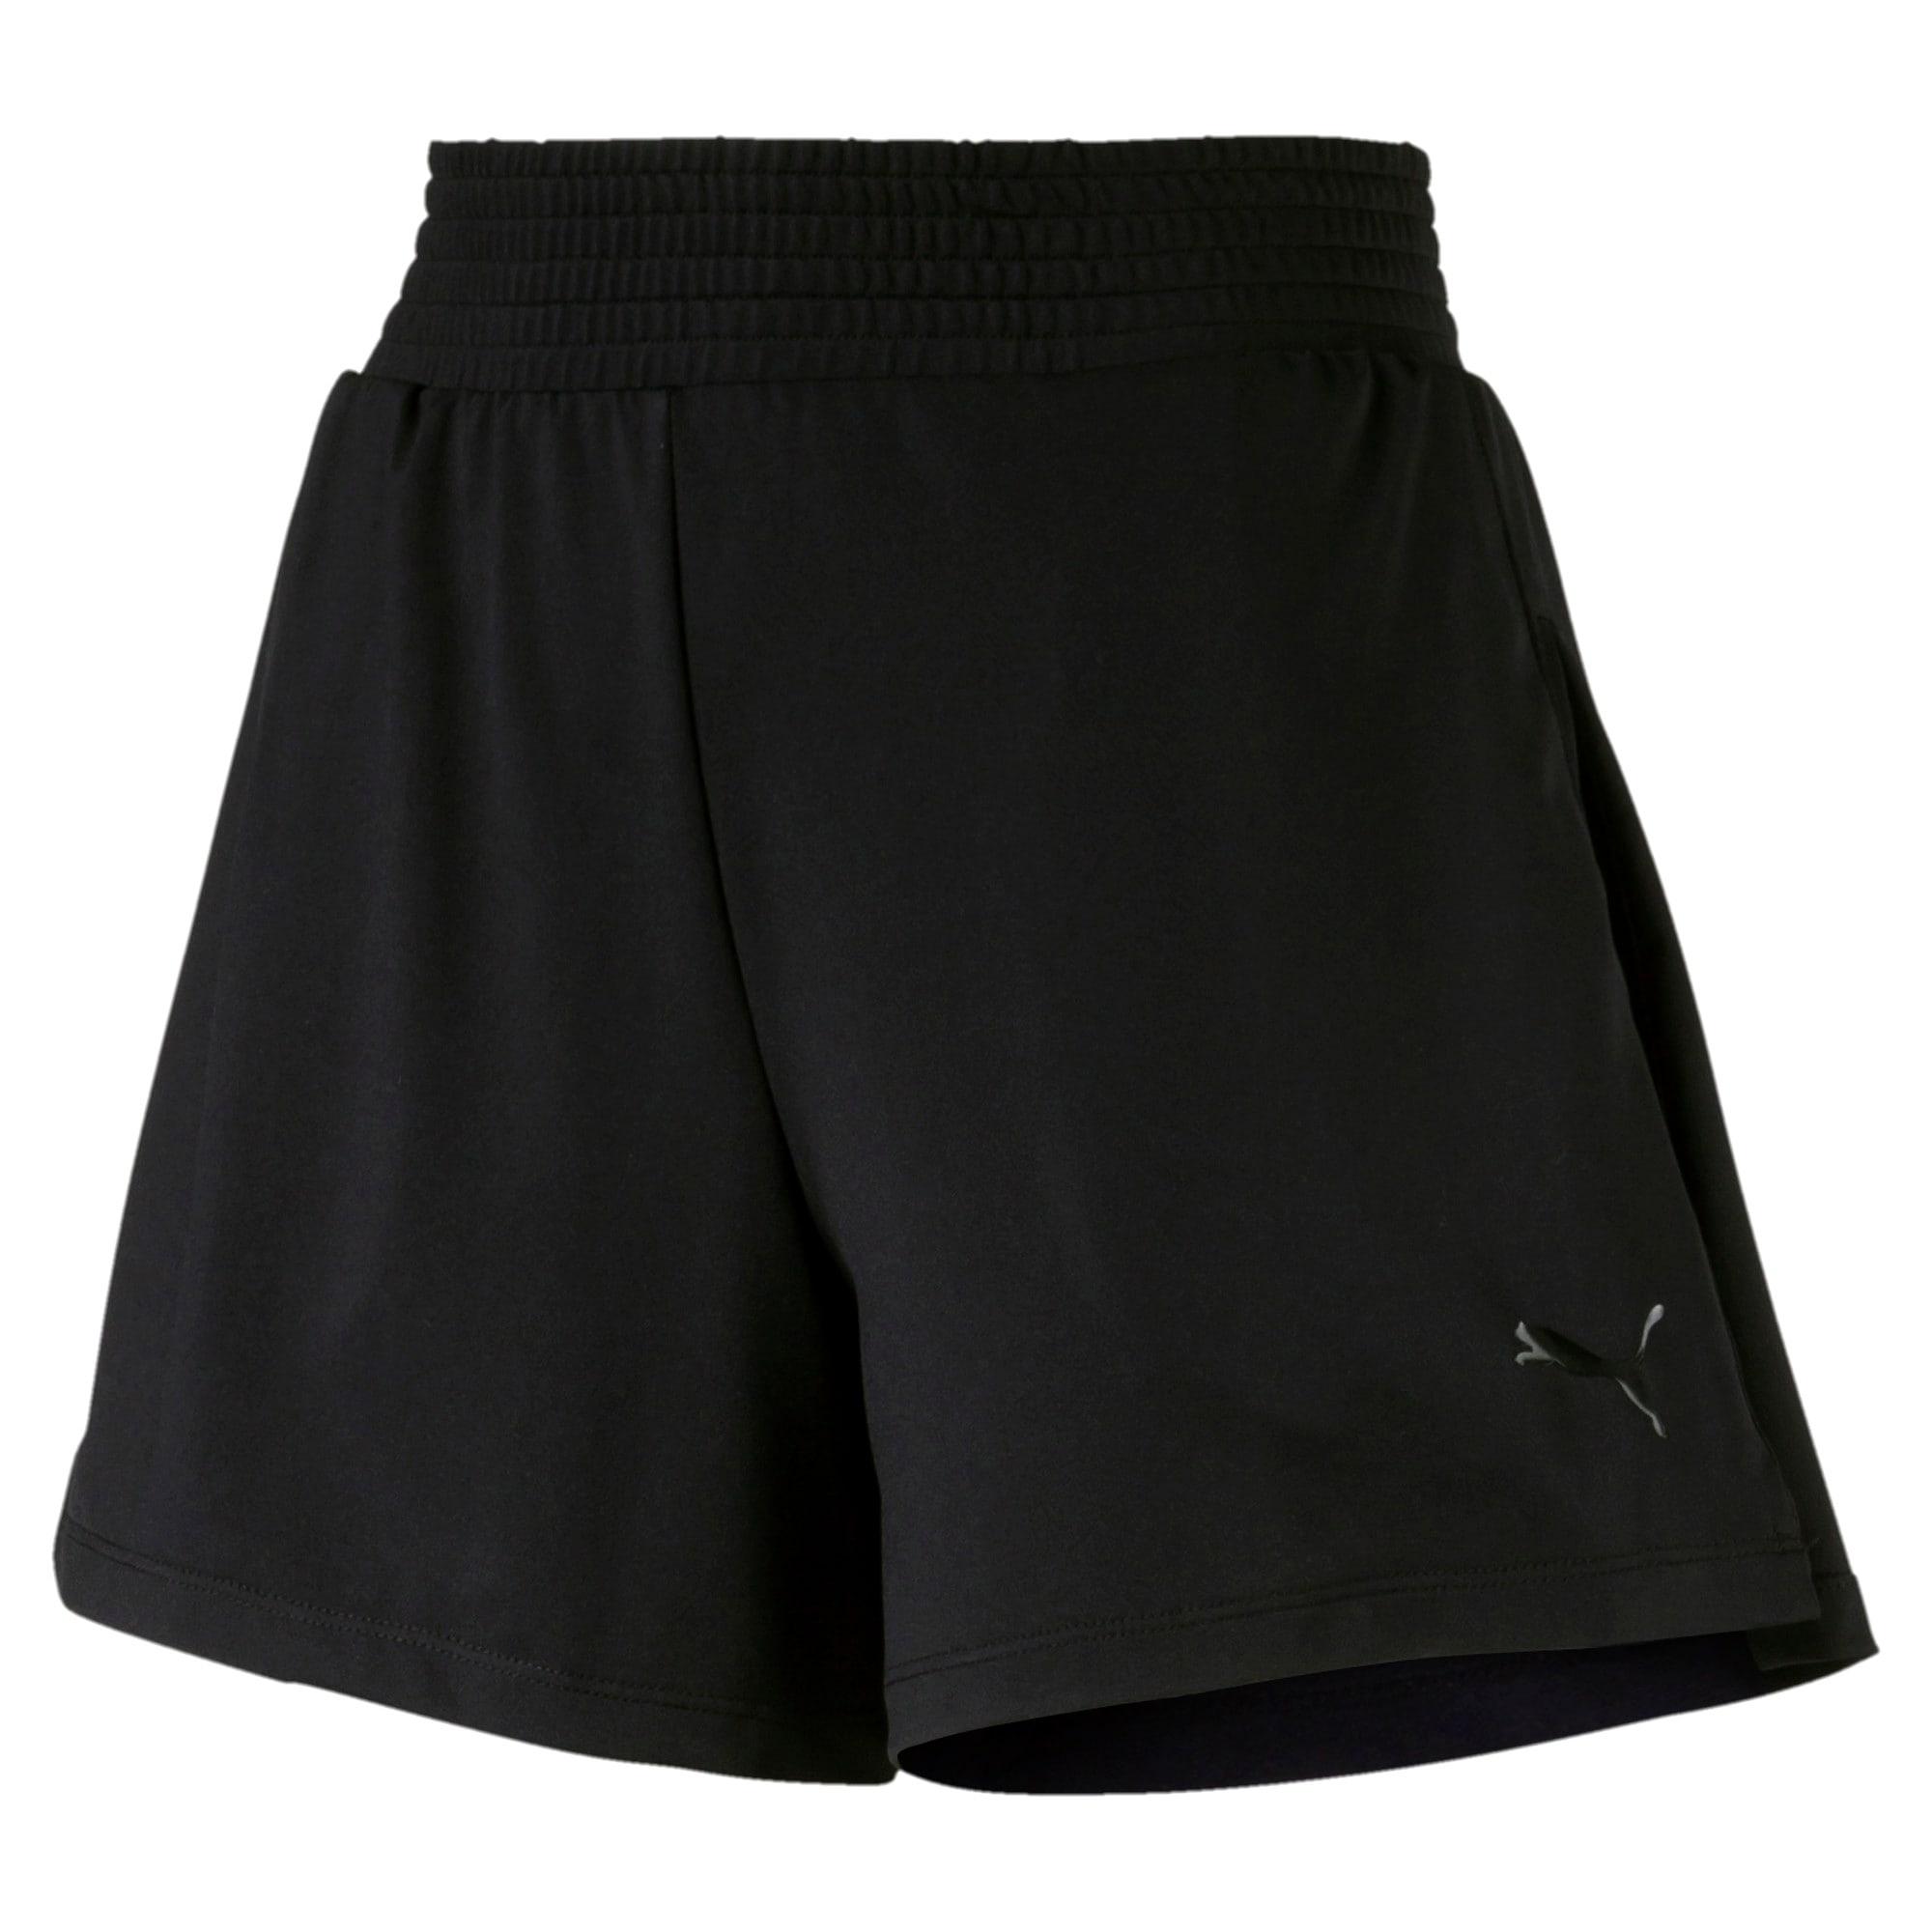 Thumbnail 1 of Soft Sports Women's Shorts, Puma Black, medium